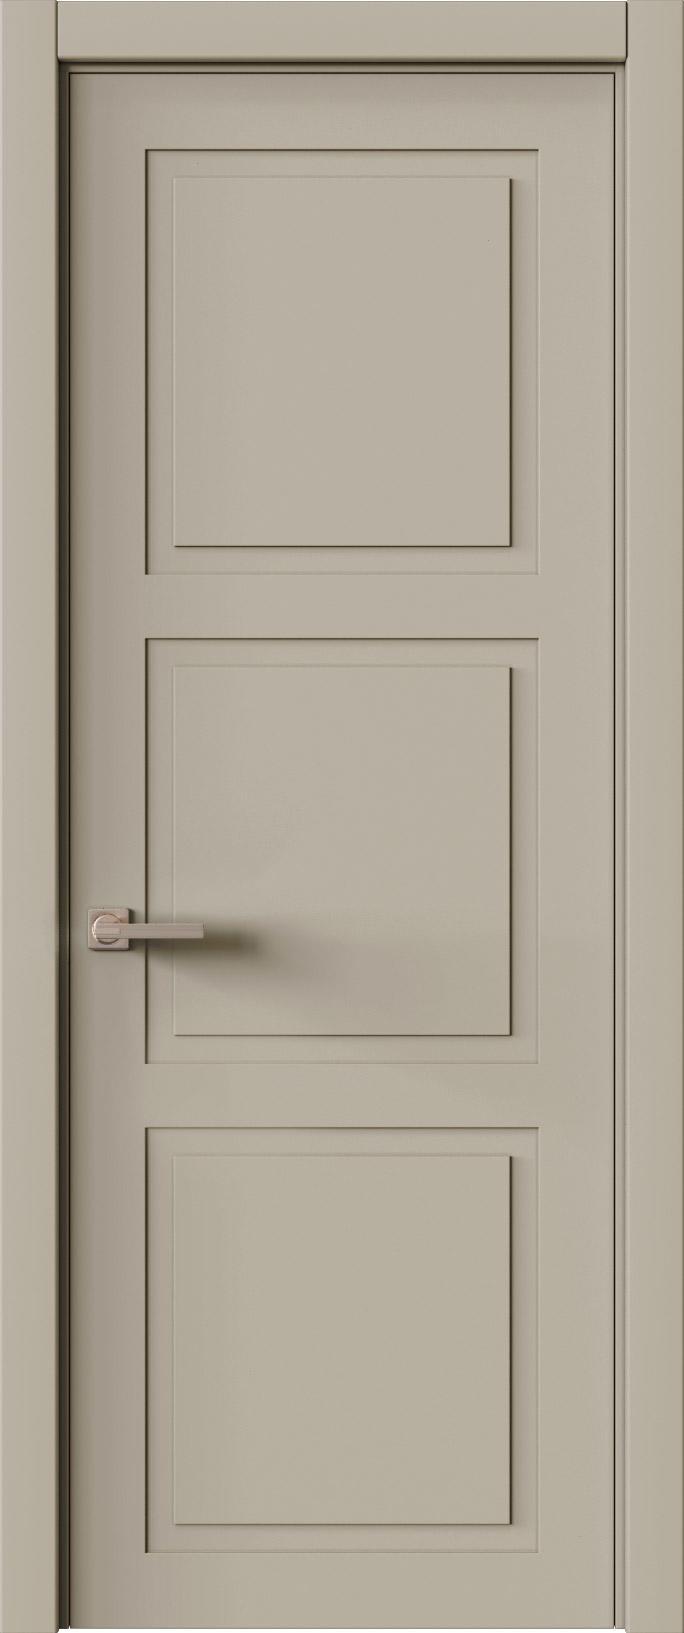 Tivoli Л-5 цвет - Серо-оливковая эмаль (RAL 7032) Без стекла (ДГ)